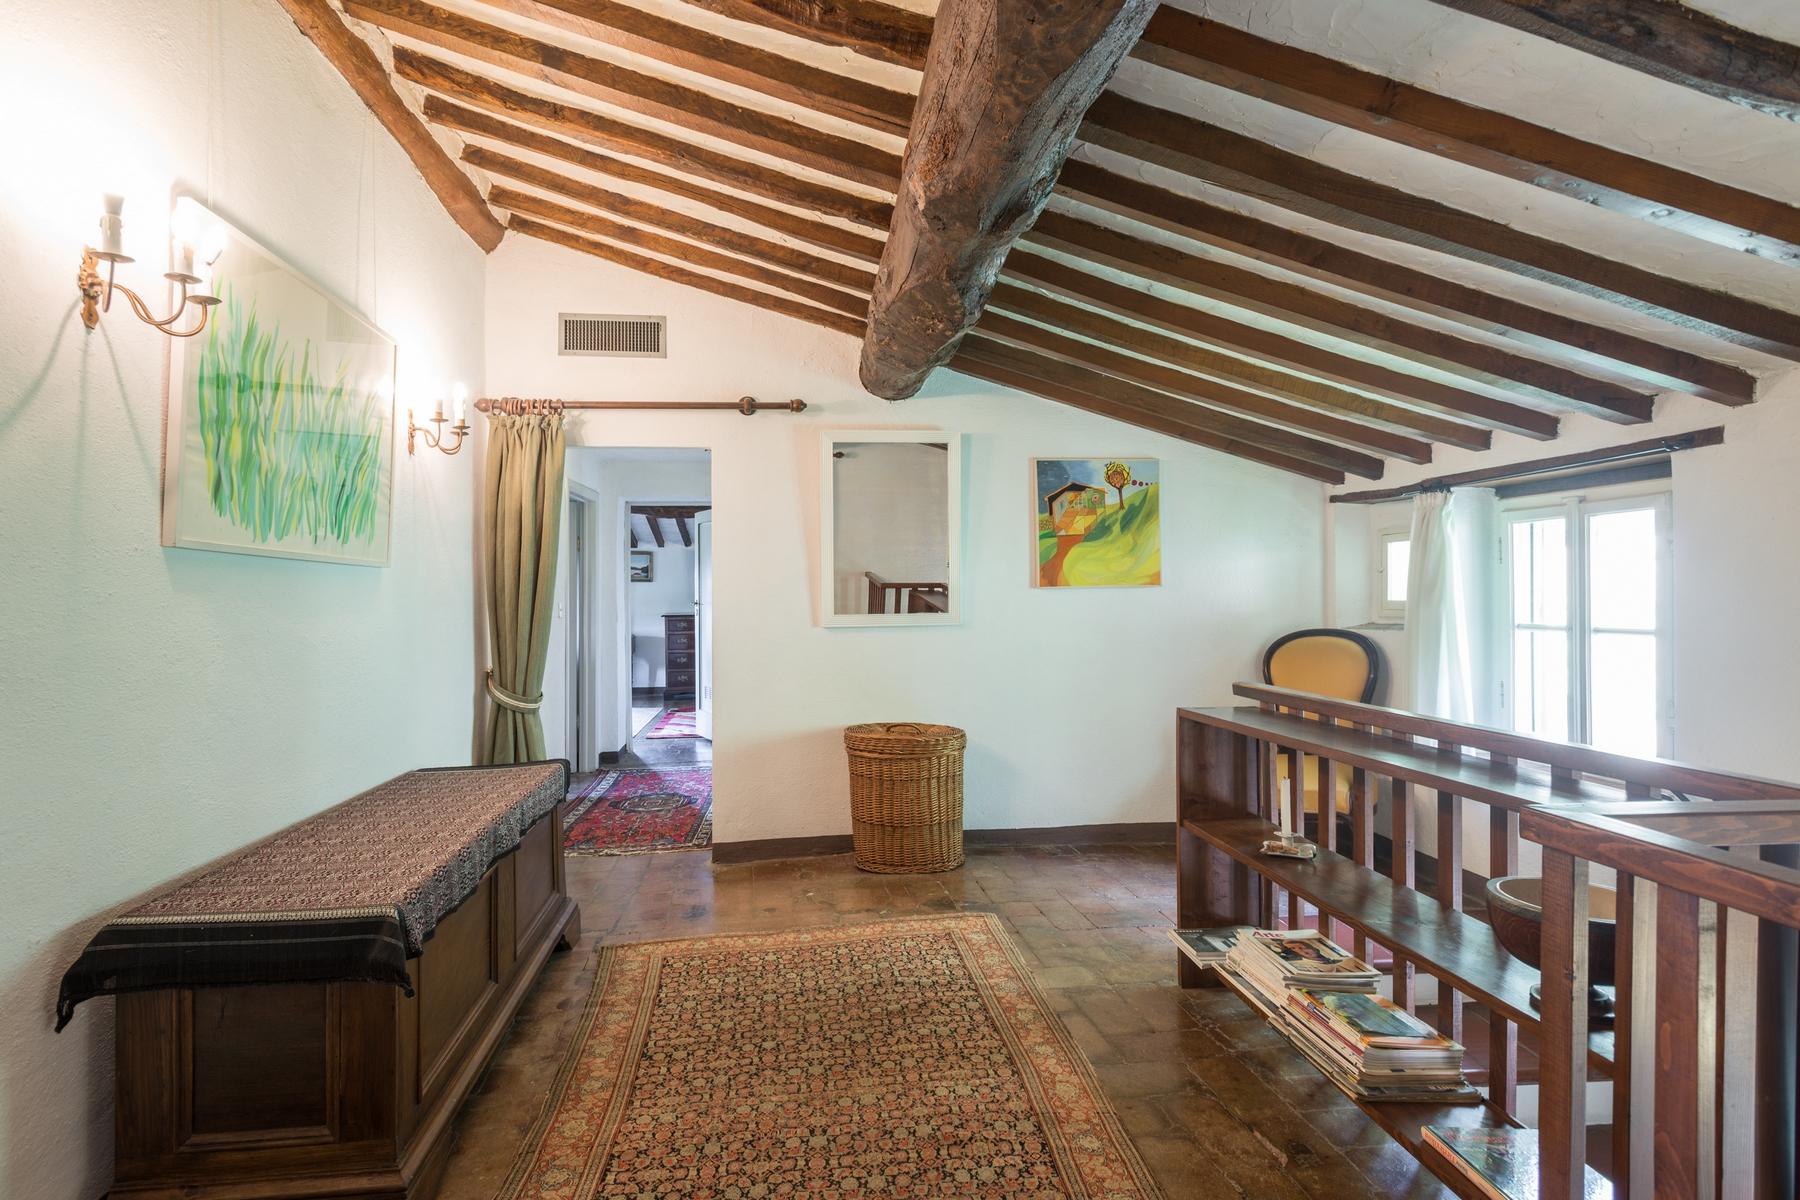 Villa in Vendita a Lucca: 5 locali, 550 mq - Foto 10